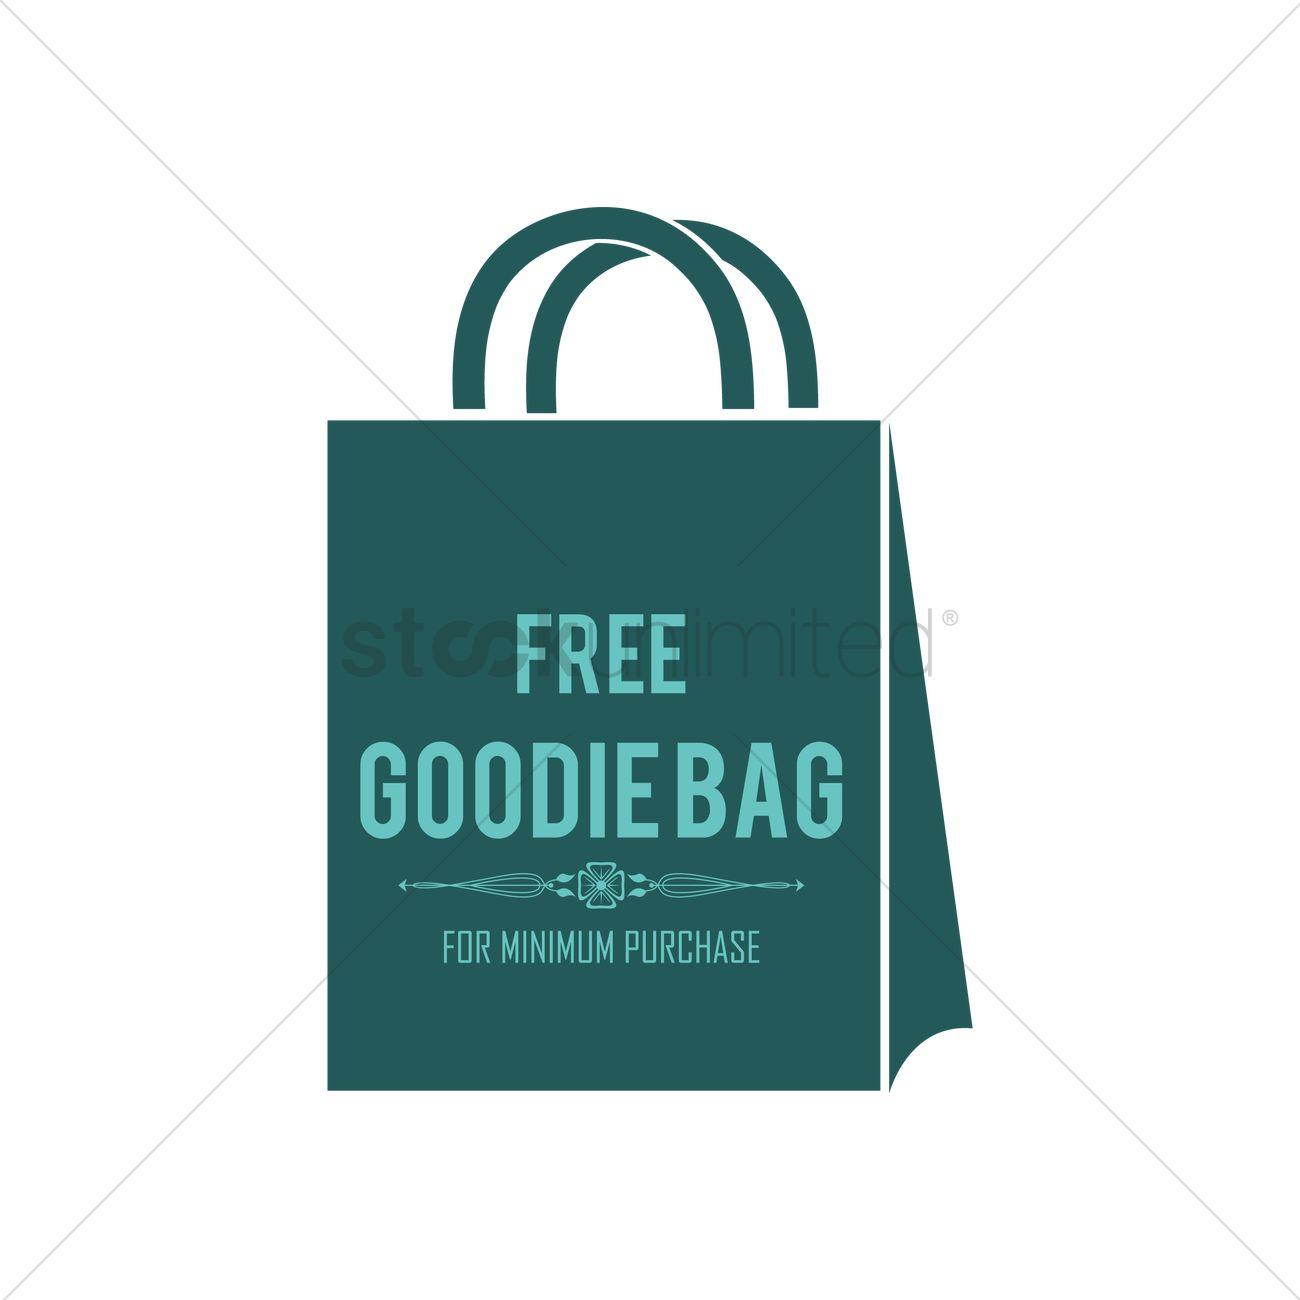 1300x1300 Free Goodie Bag Label Vector Image